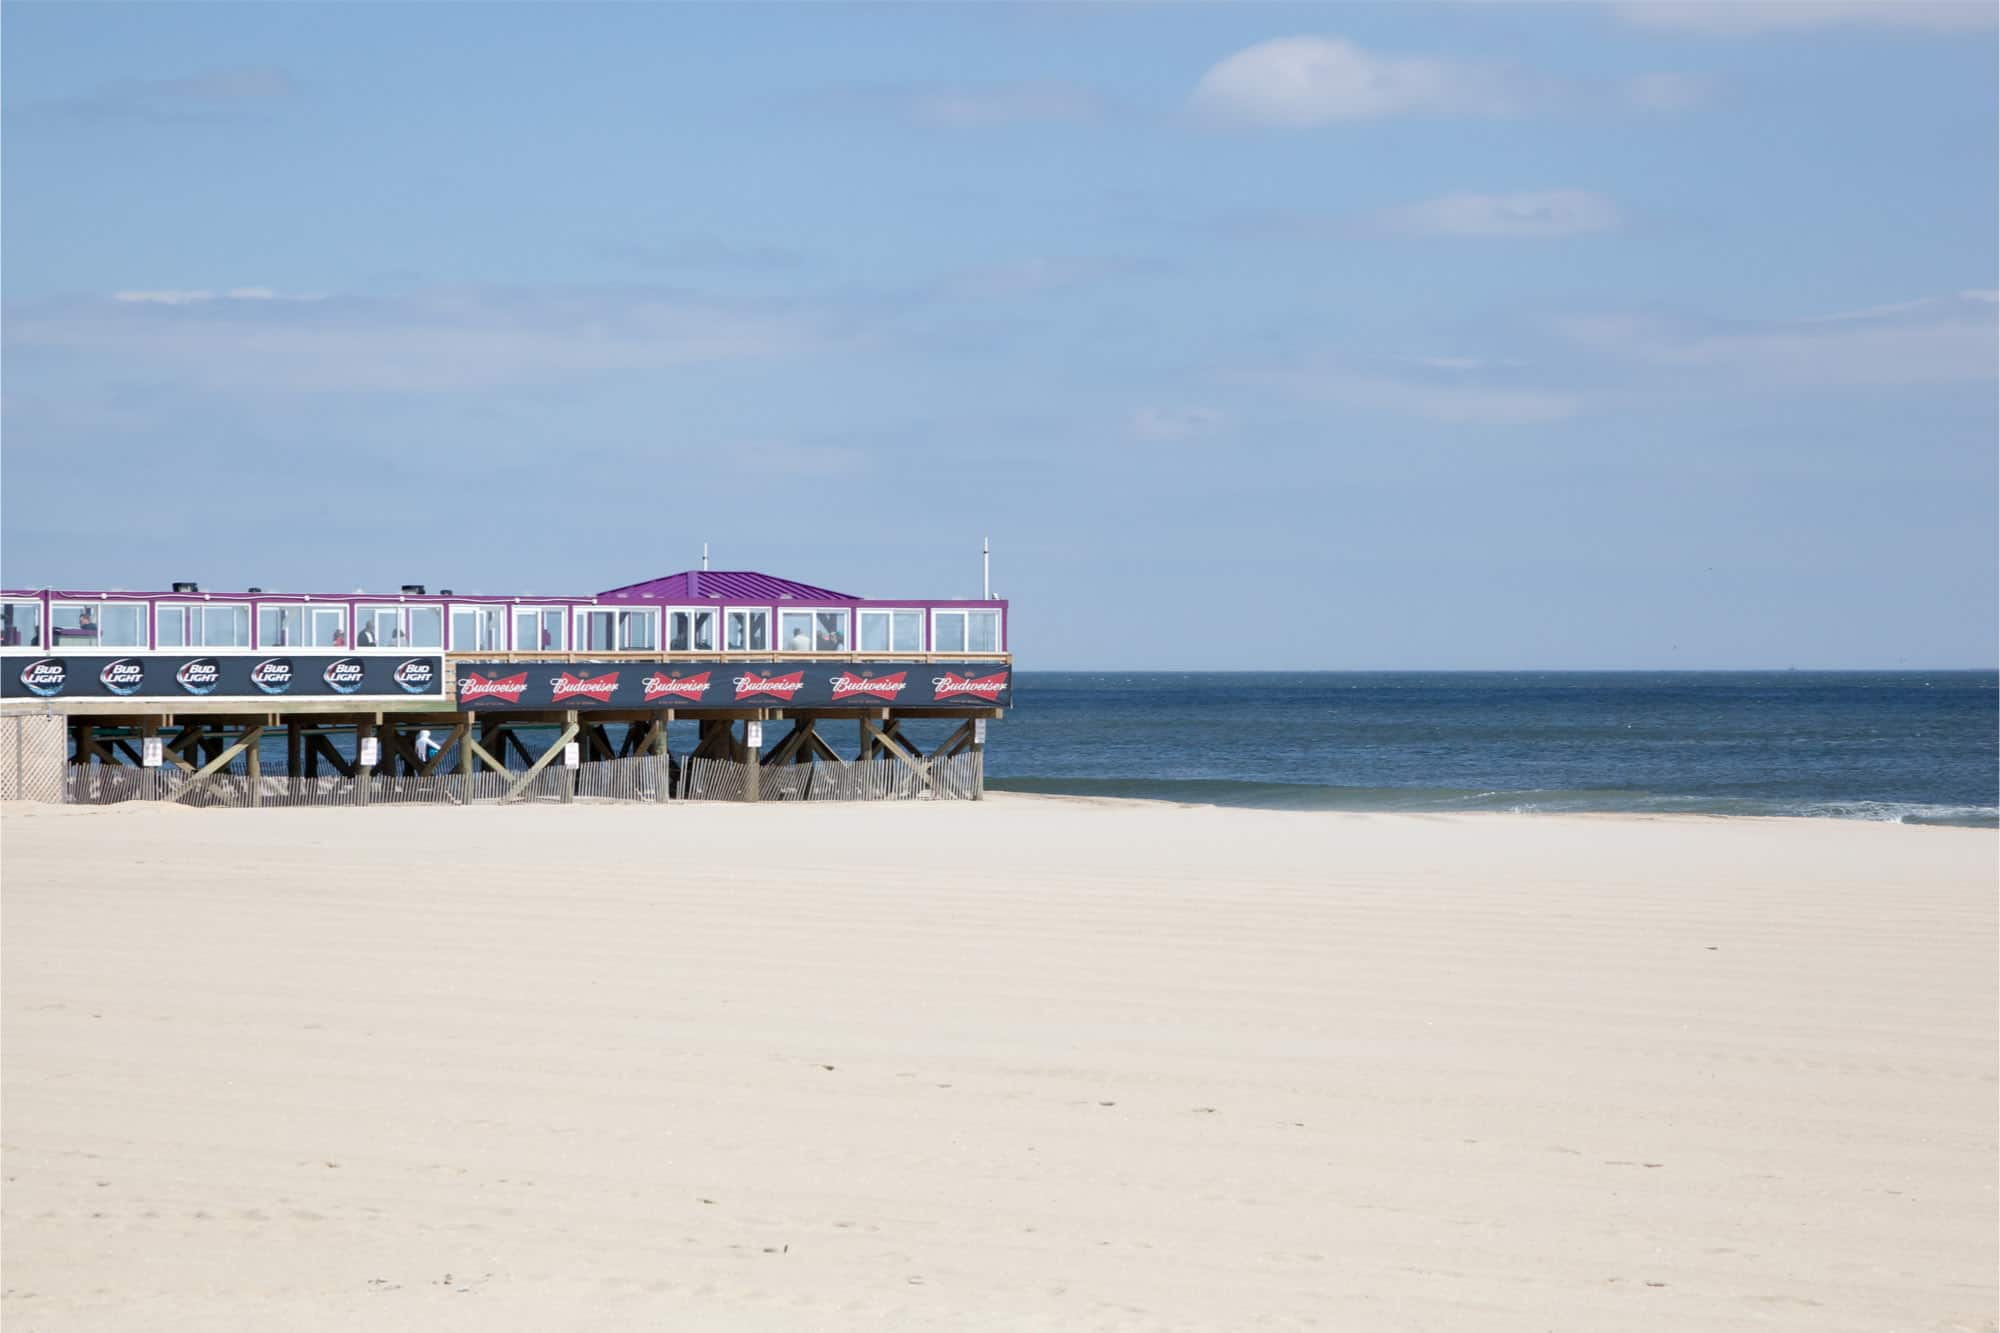 Pier over beach